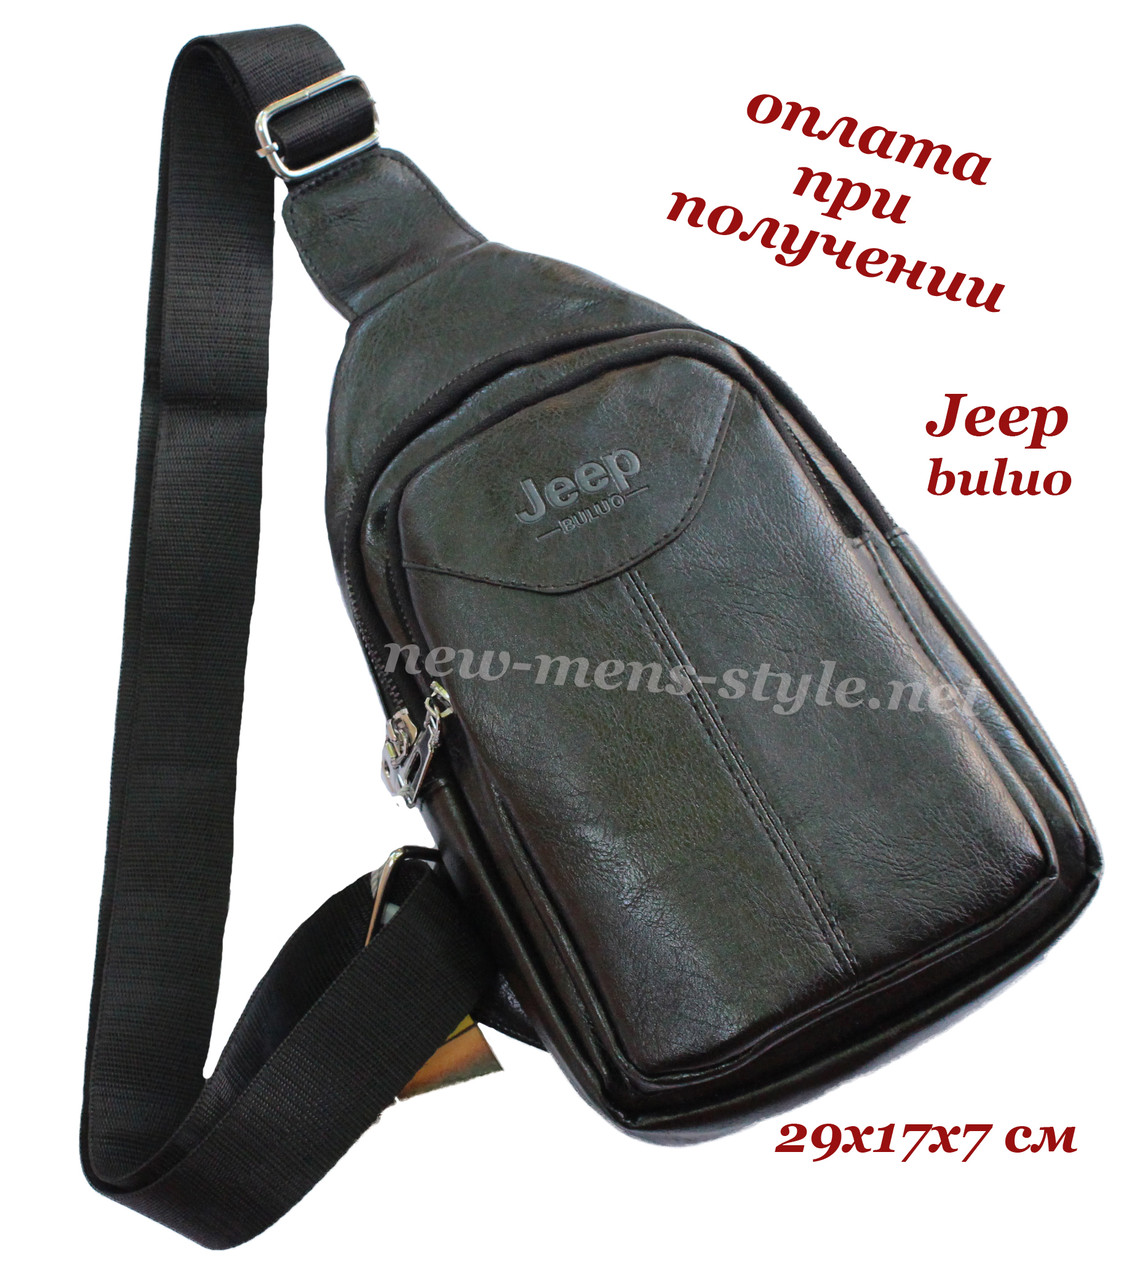 Мужская чоловіча спортивная кожаная сумка слинг рюкзак бананка через плечо и на груди Jeep buluo